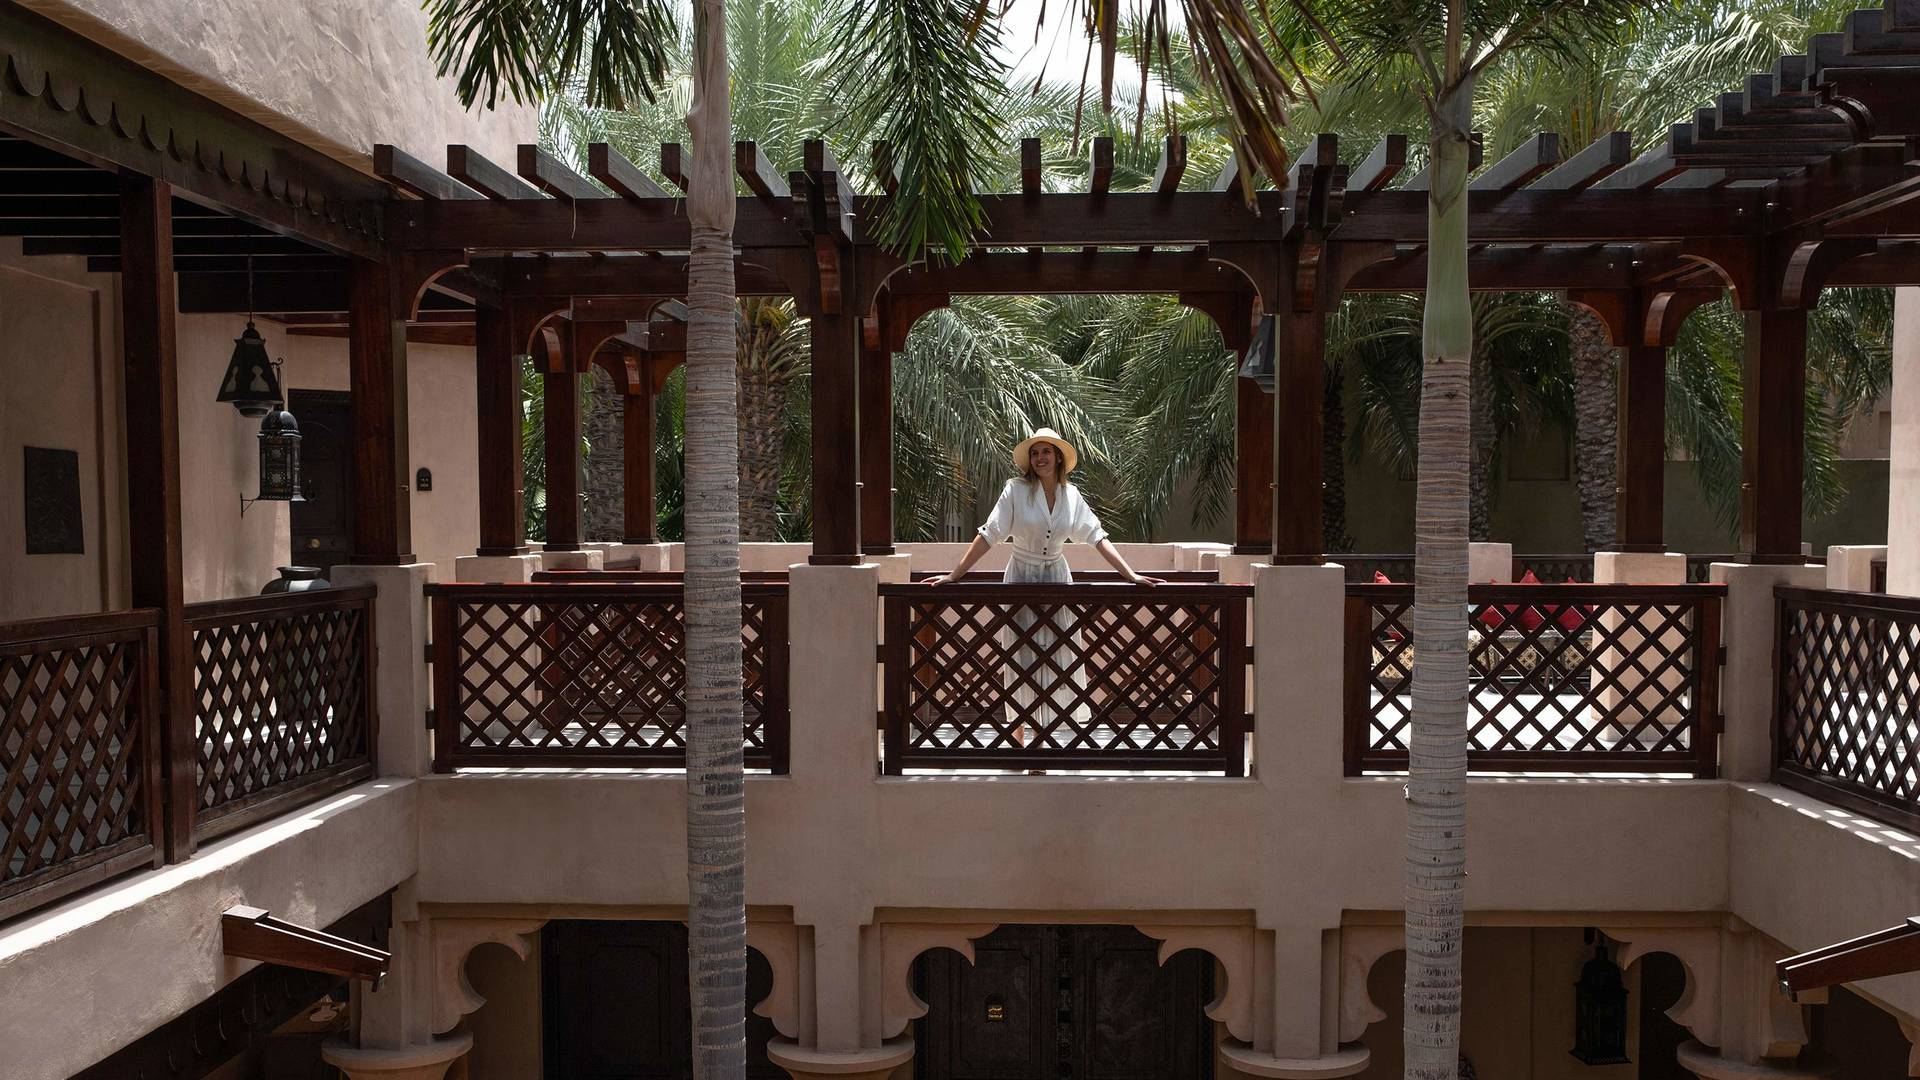 Lady on the balcony at the Jumeirah Dar Al Masayaf hotel